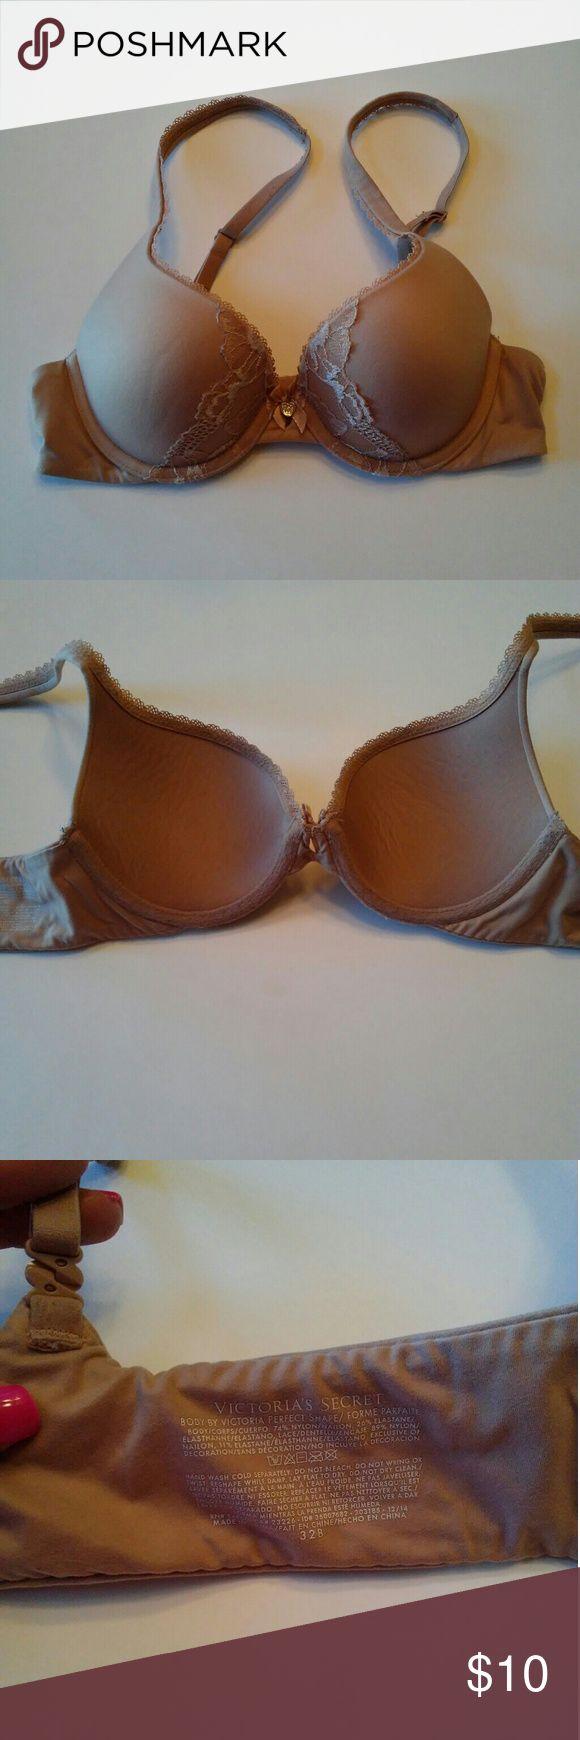 Victoria's Secret Bra Size 32 B Padded  Multifunctional Great condition Victoria's Secret Intimates & Sleepwear Bras